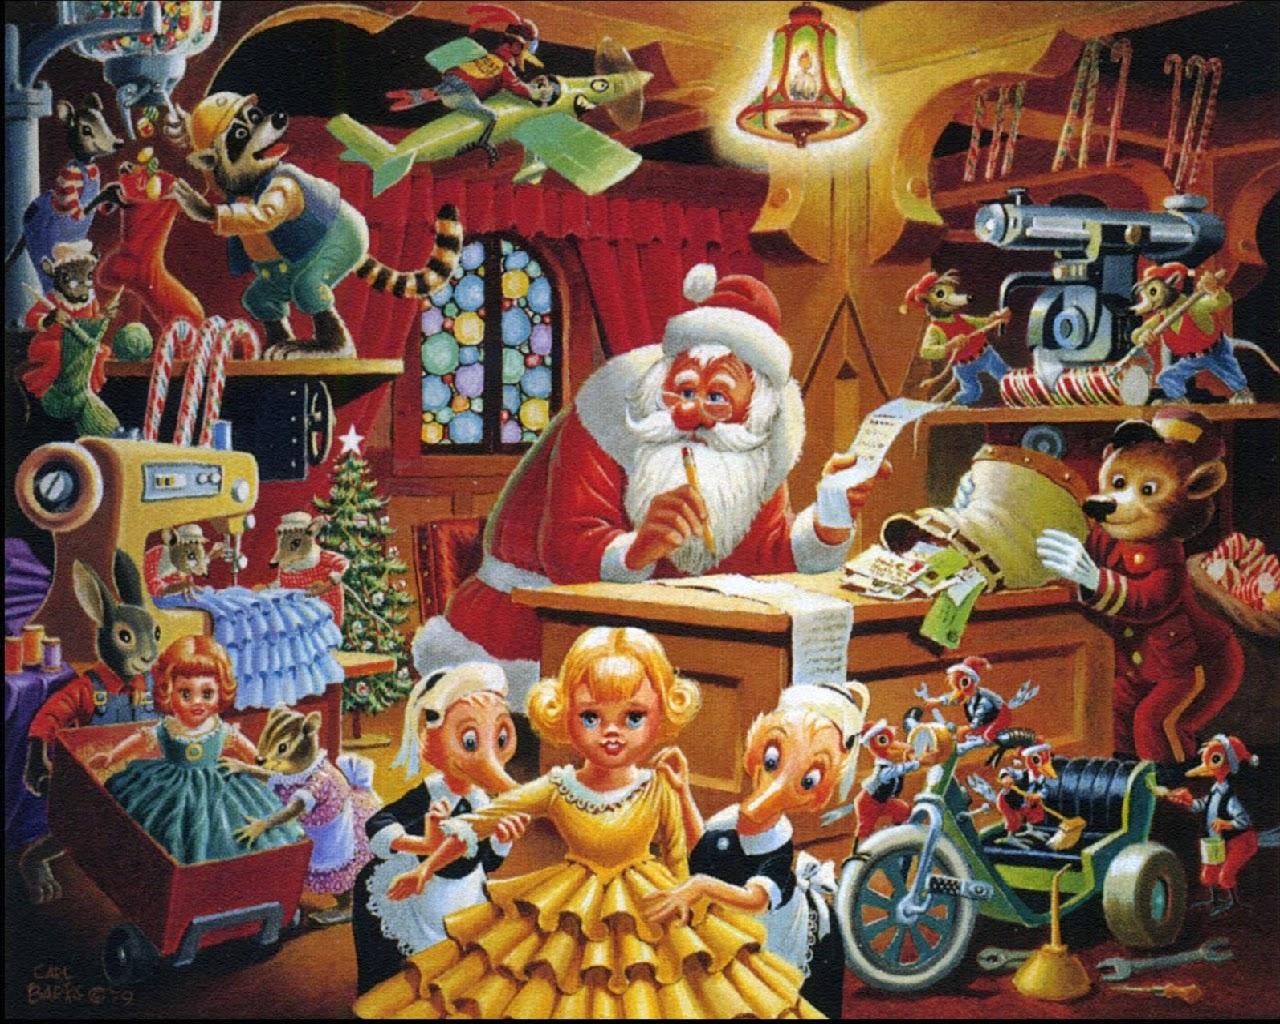 Santa-claus-preparing-for-gifts-distribution-image-wallpaper-1024x780.jpg